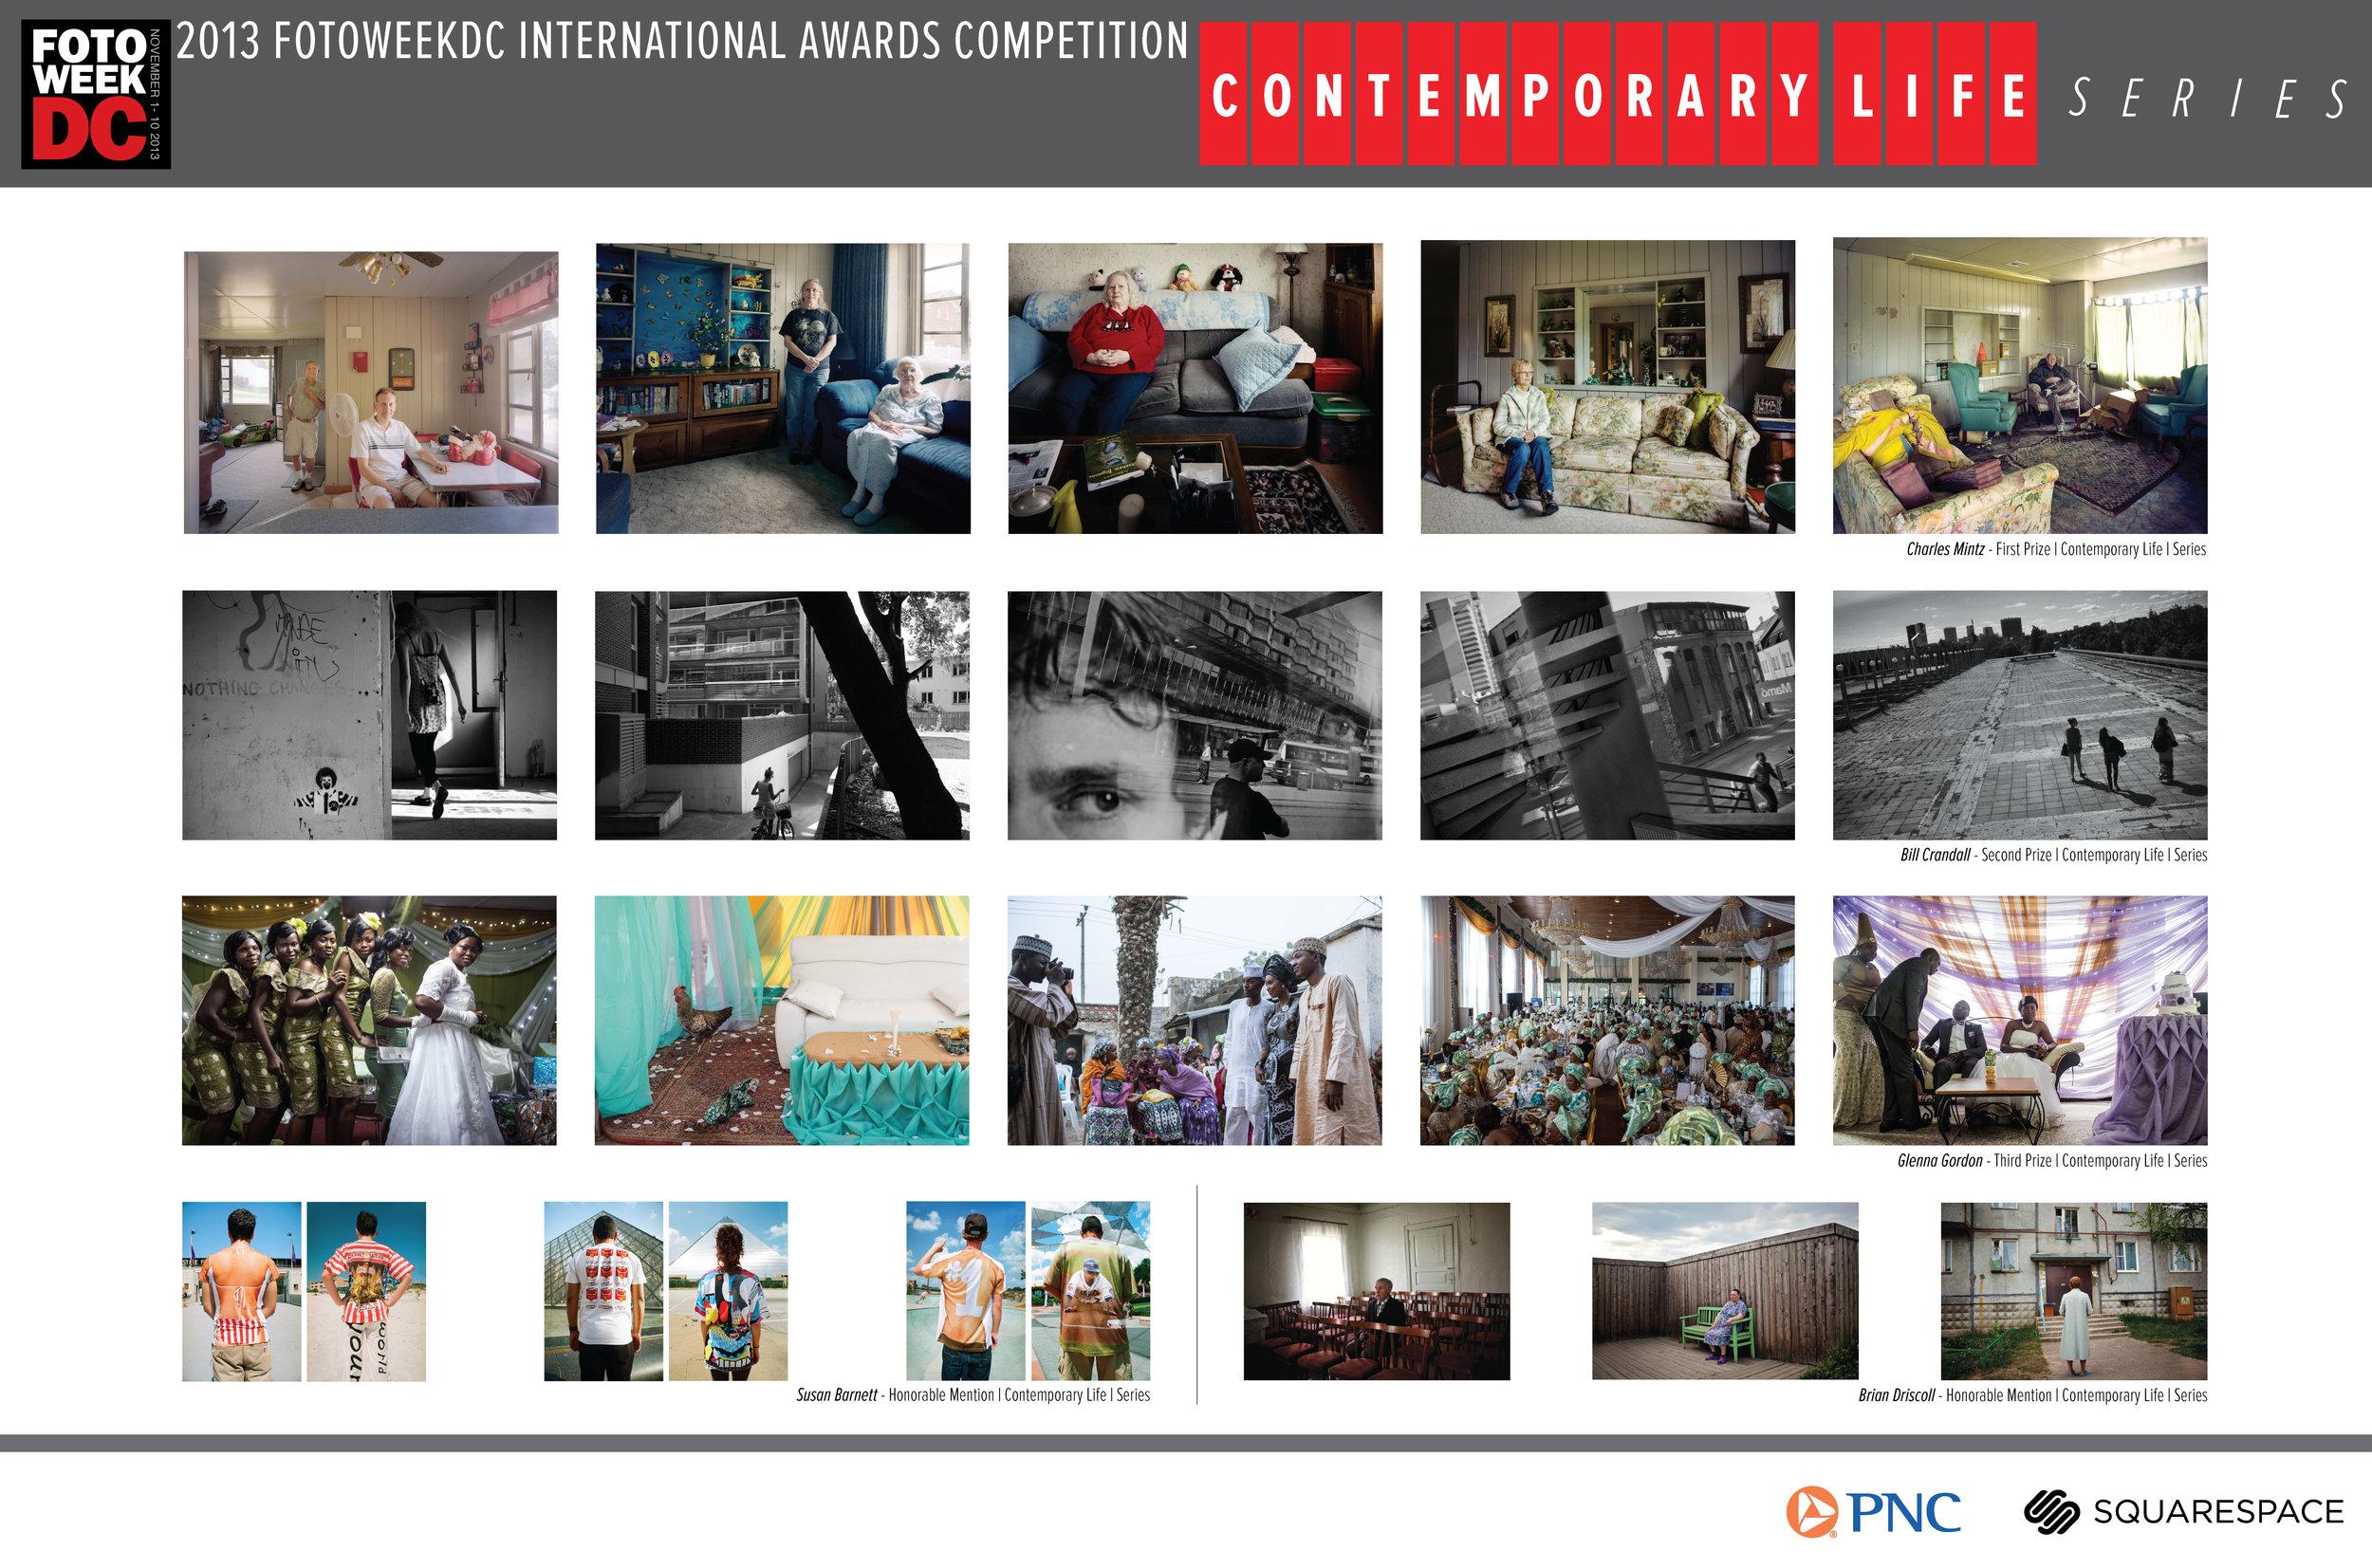 ContemporaryLife_Series.jpg